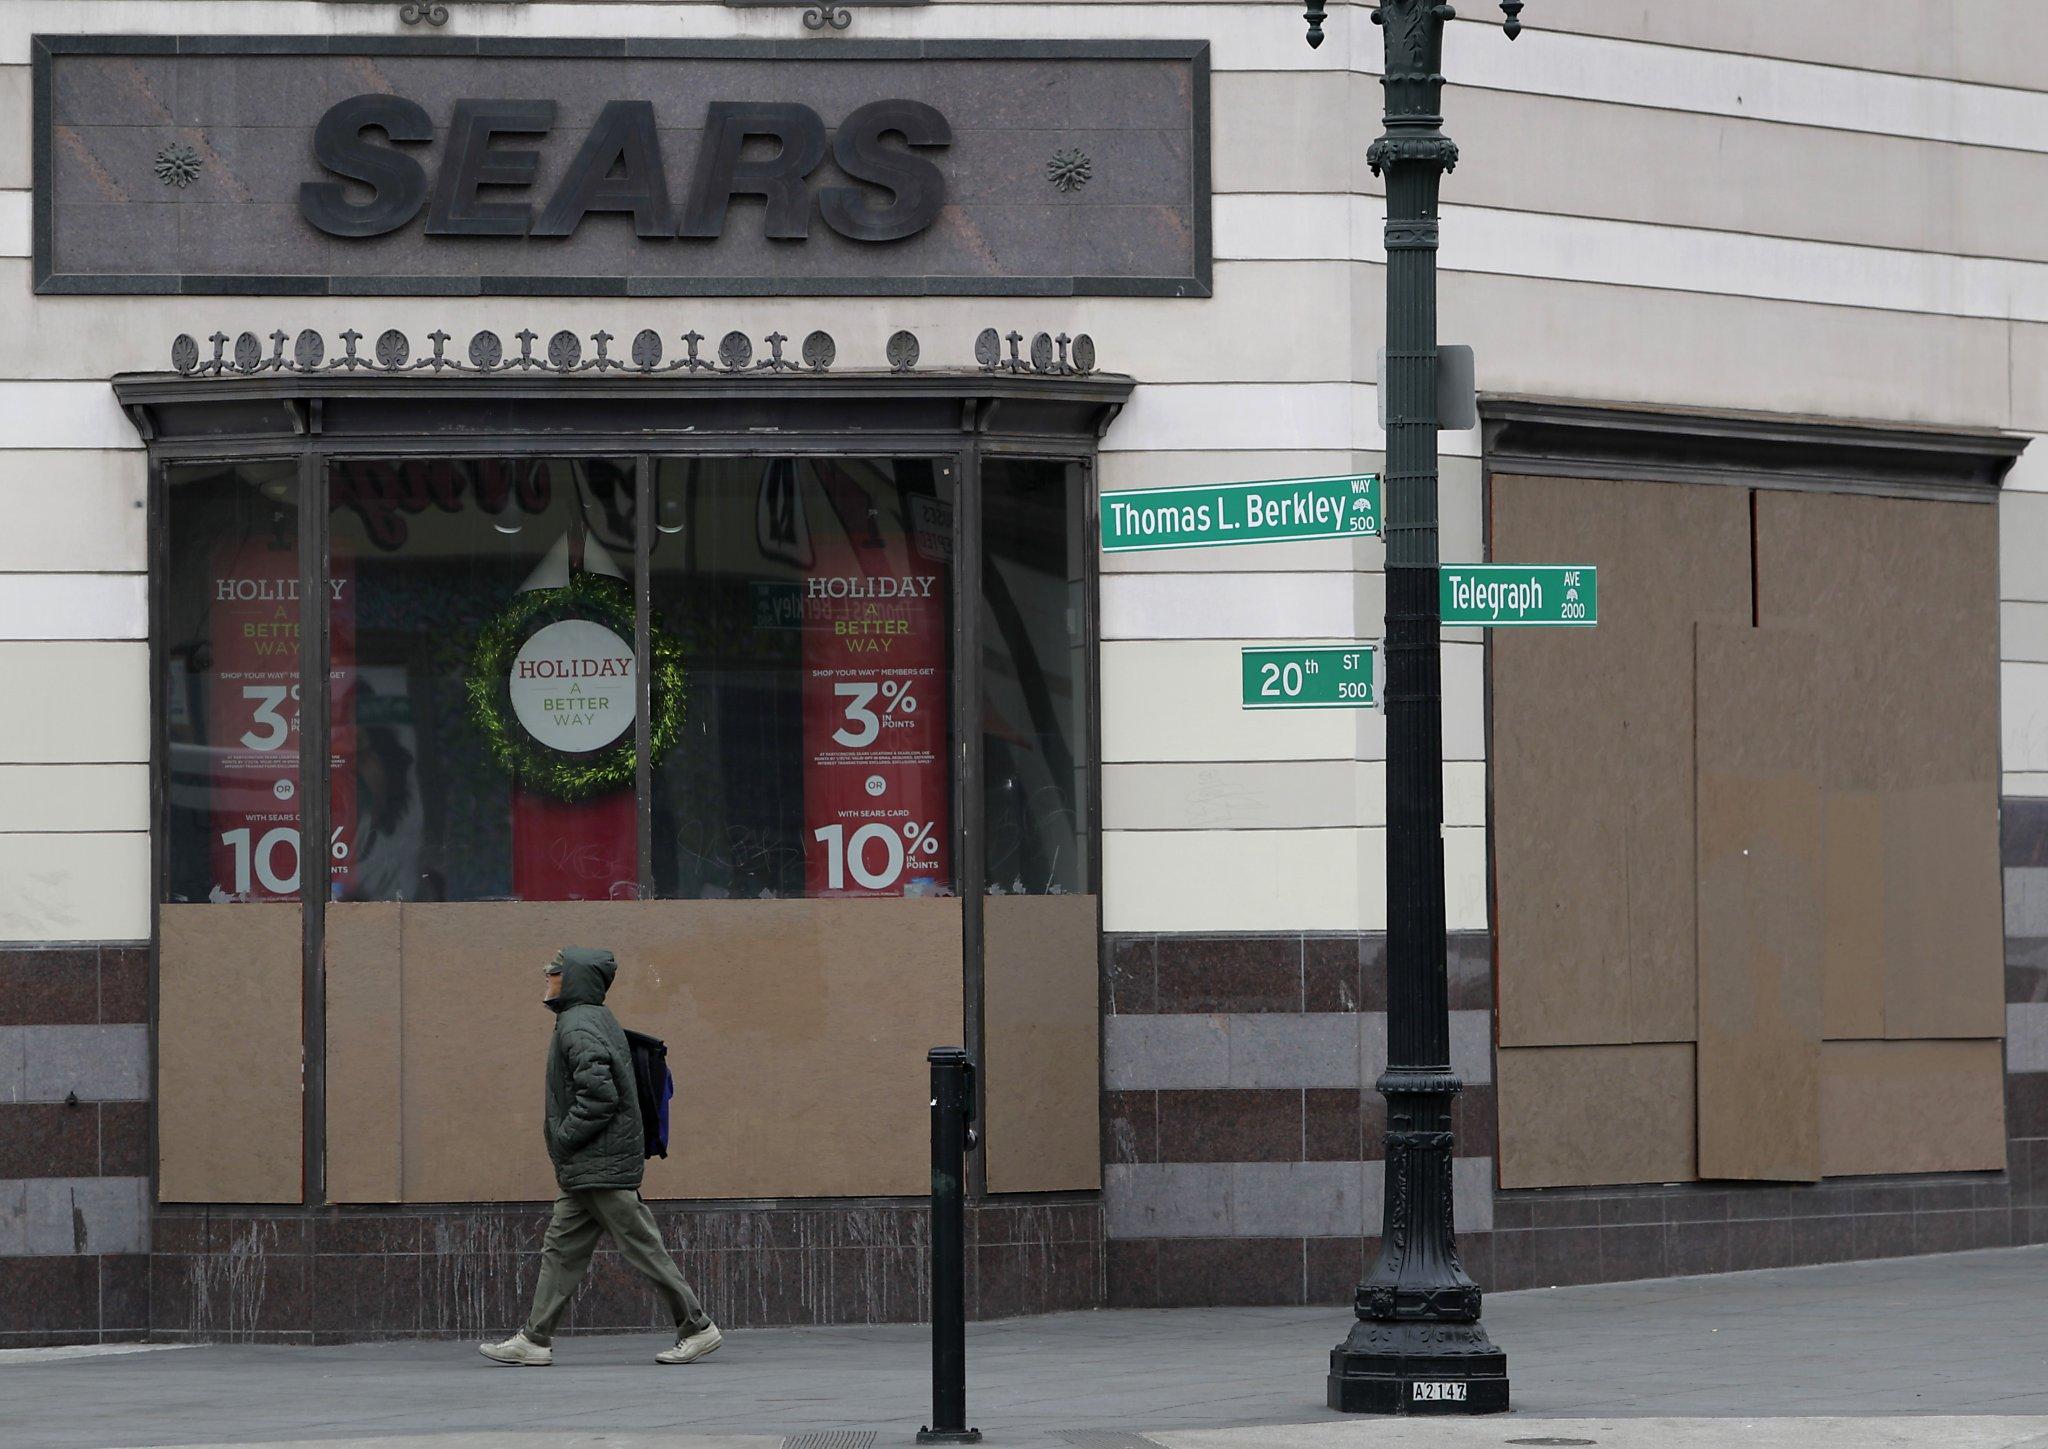 Sears Oakland Broken Windows Fix On The Way